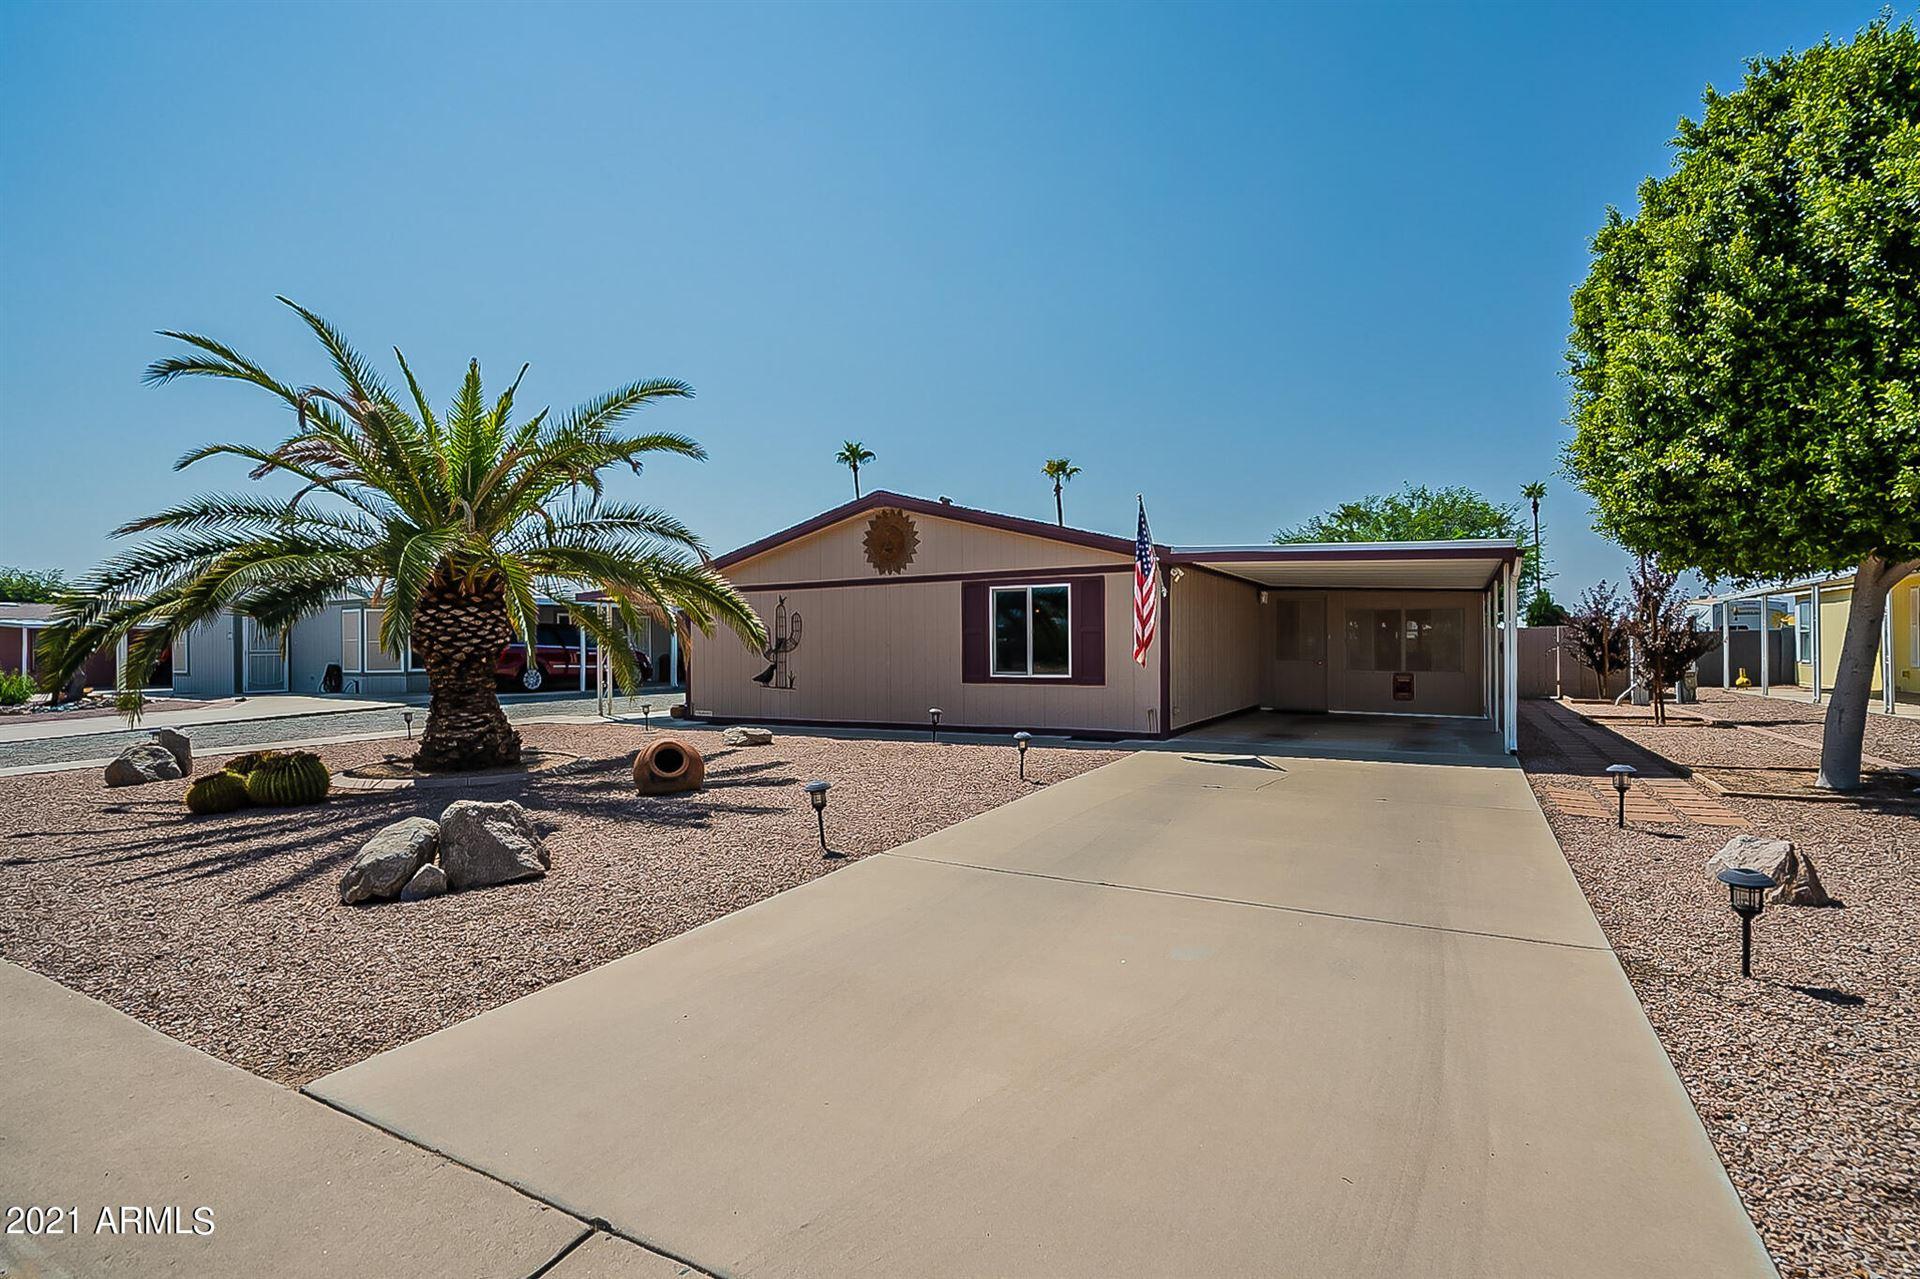 358 N PINAL Drive, Apache Junction, AZ 85120 - #: 6293434